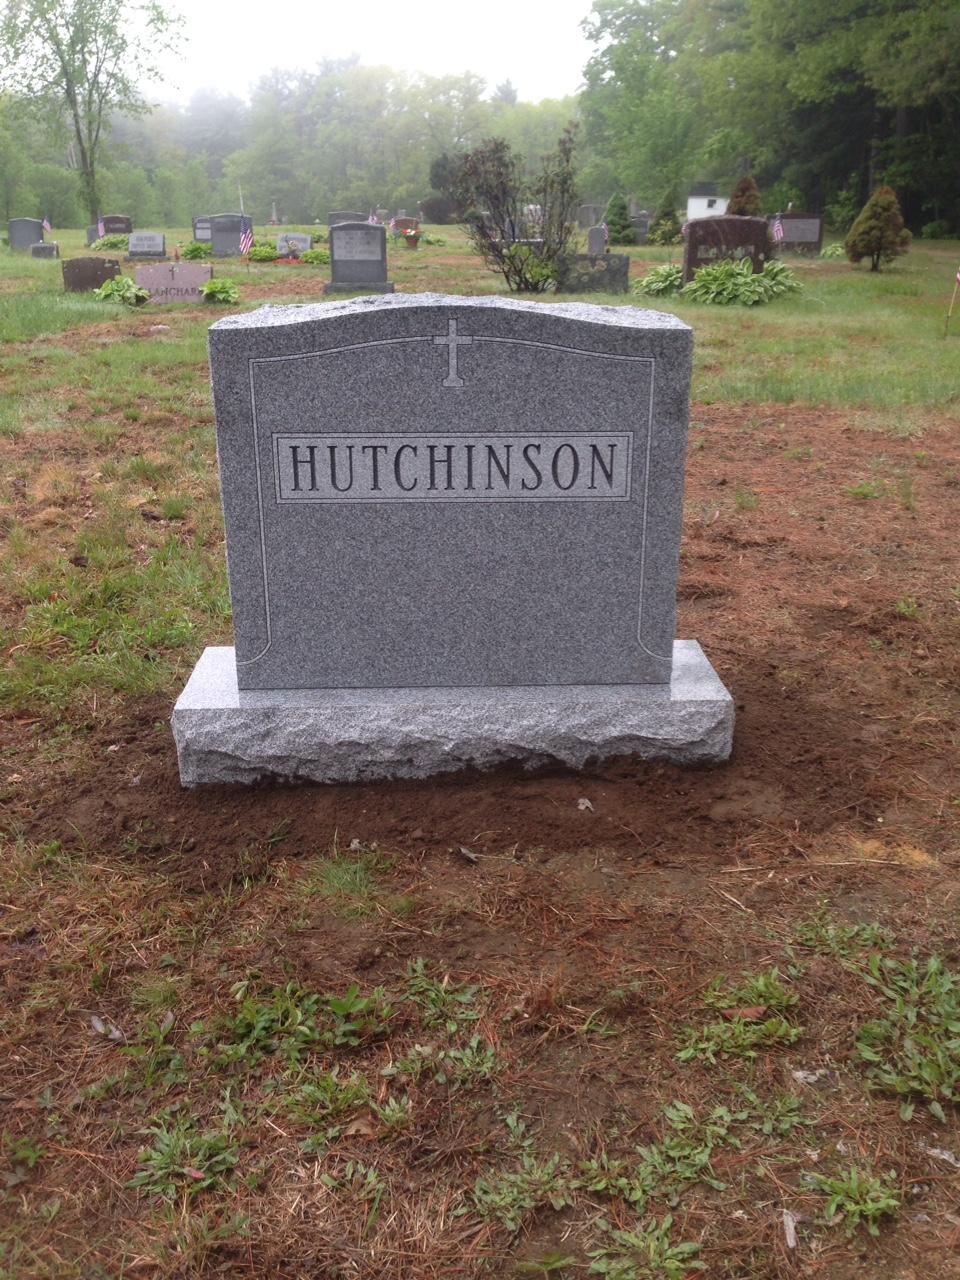 HUTCHINSON front.JPG